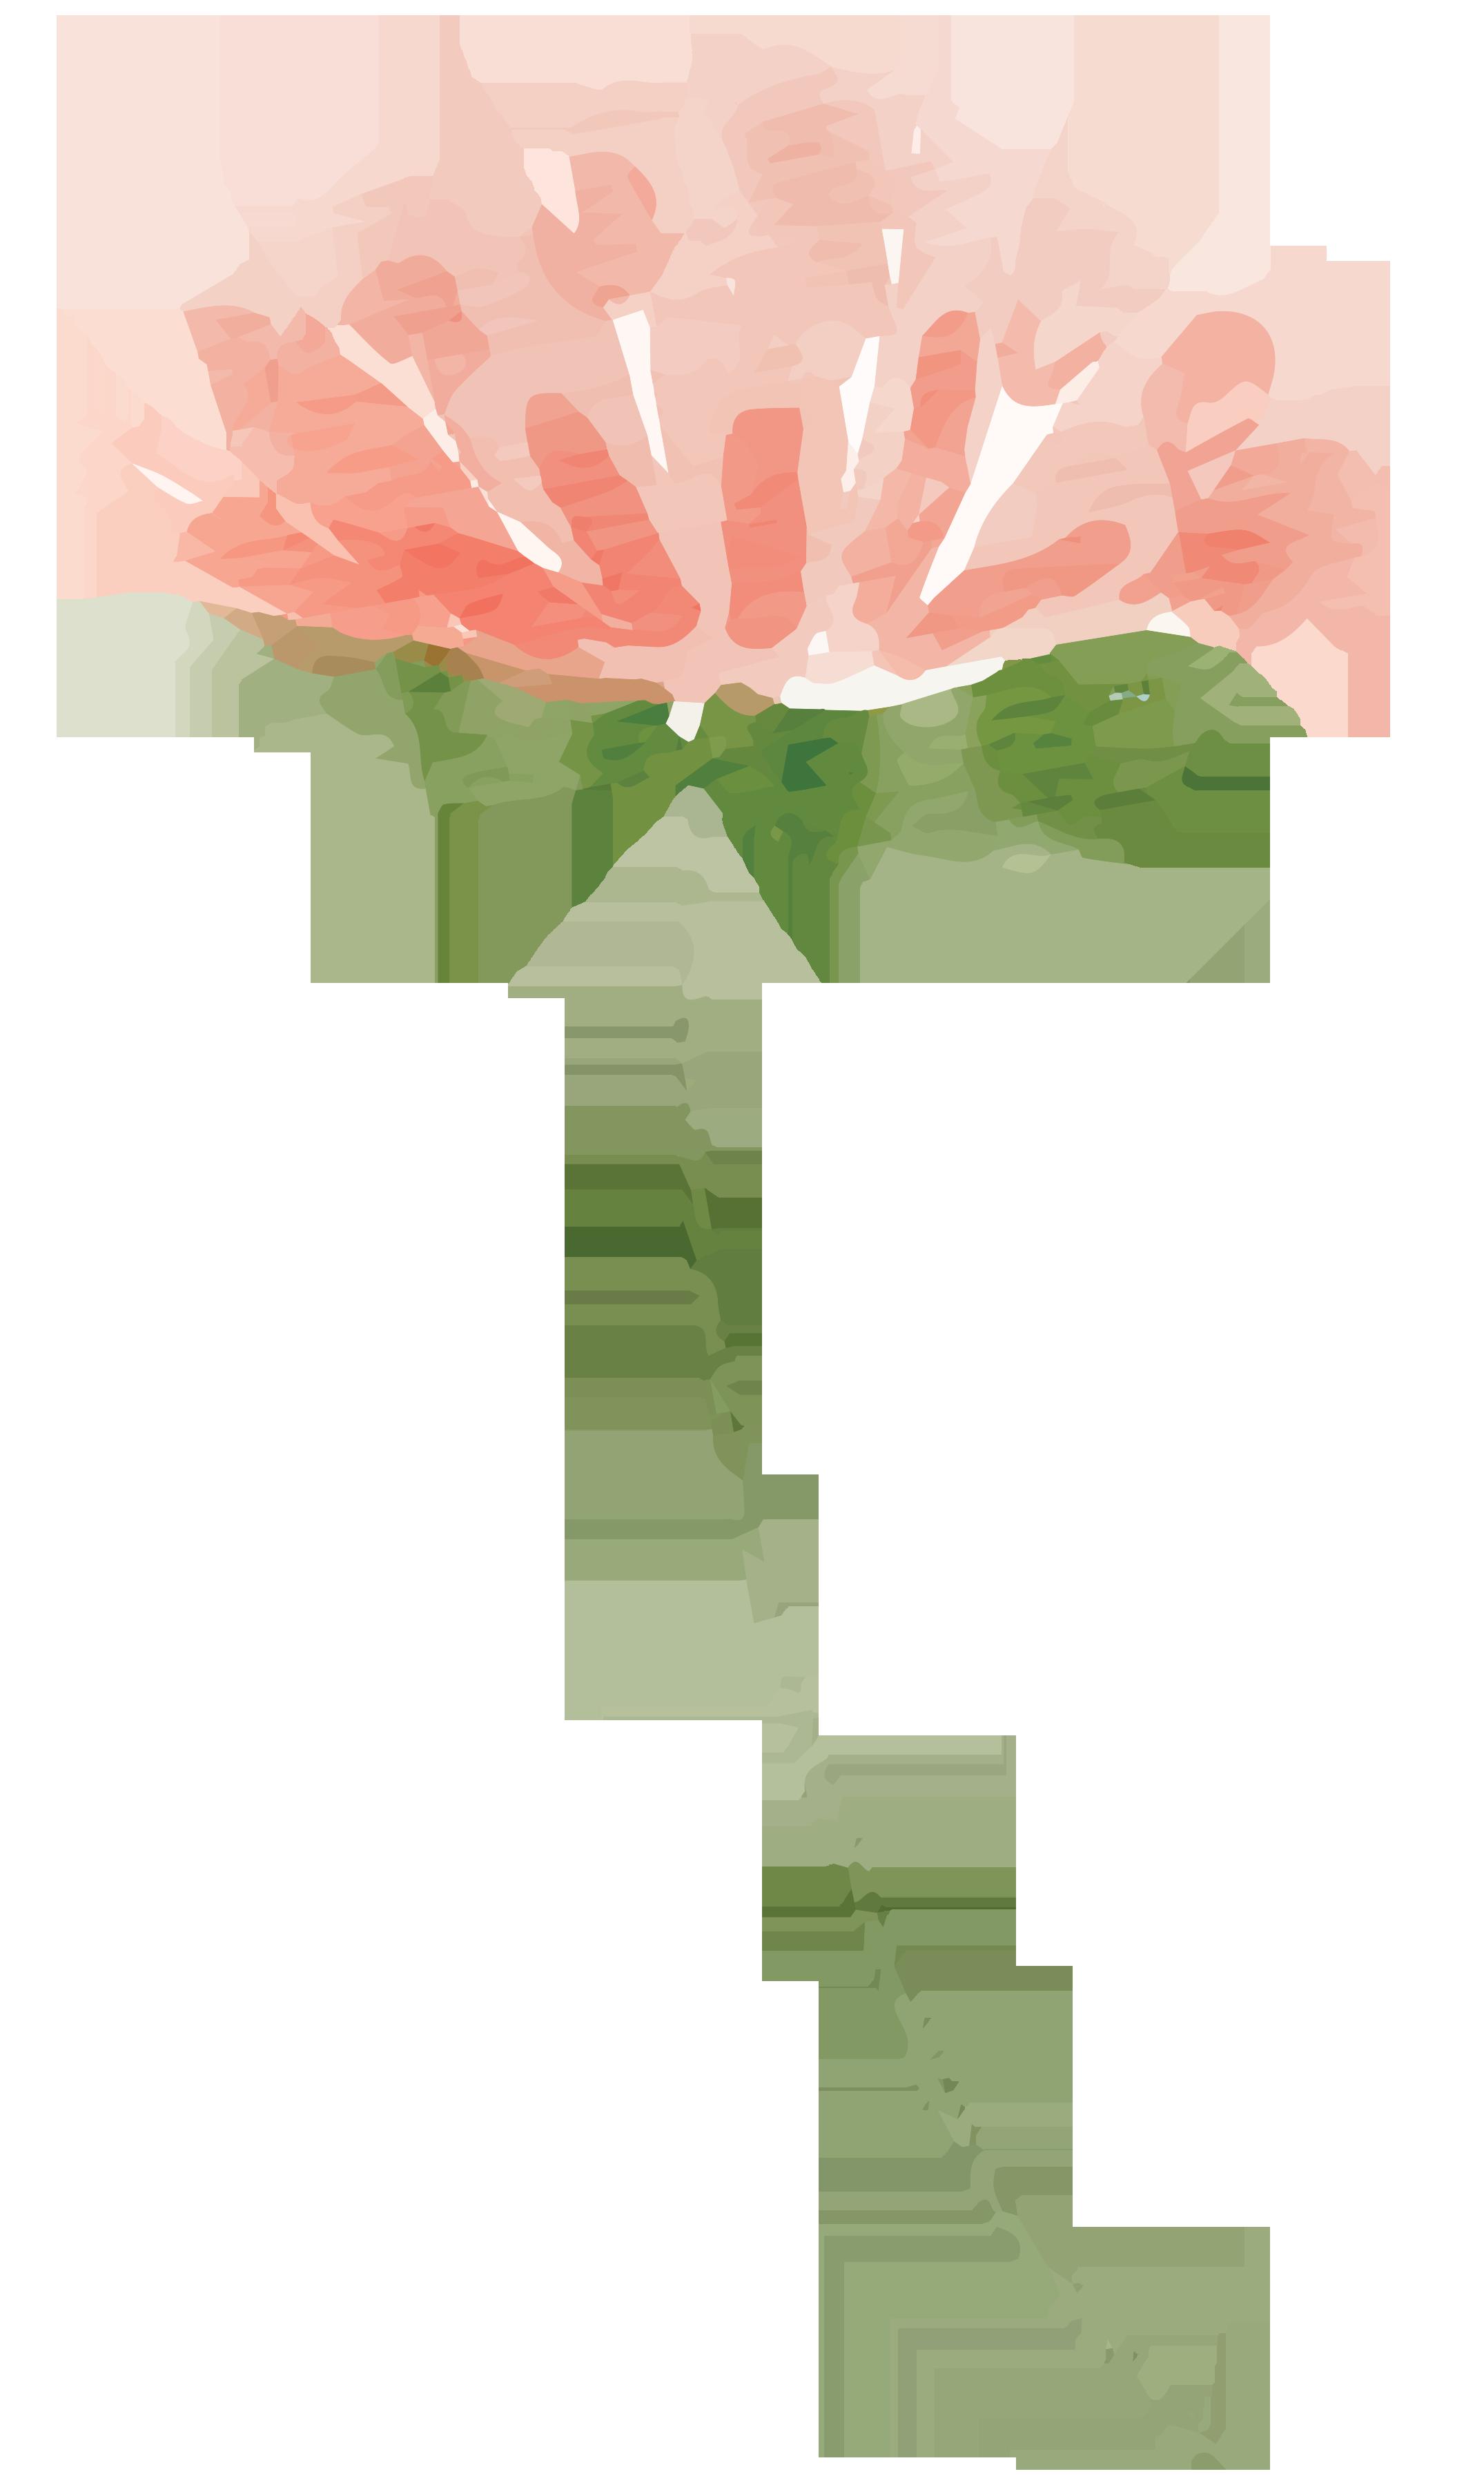 Pumpkin stem image clipart freeuse Peach Flower Clipart pumpkin flower - Free Clipart on ... freeuse